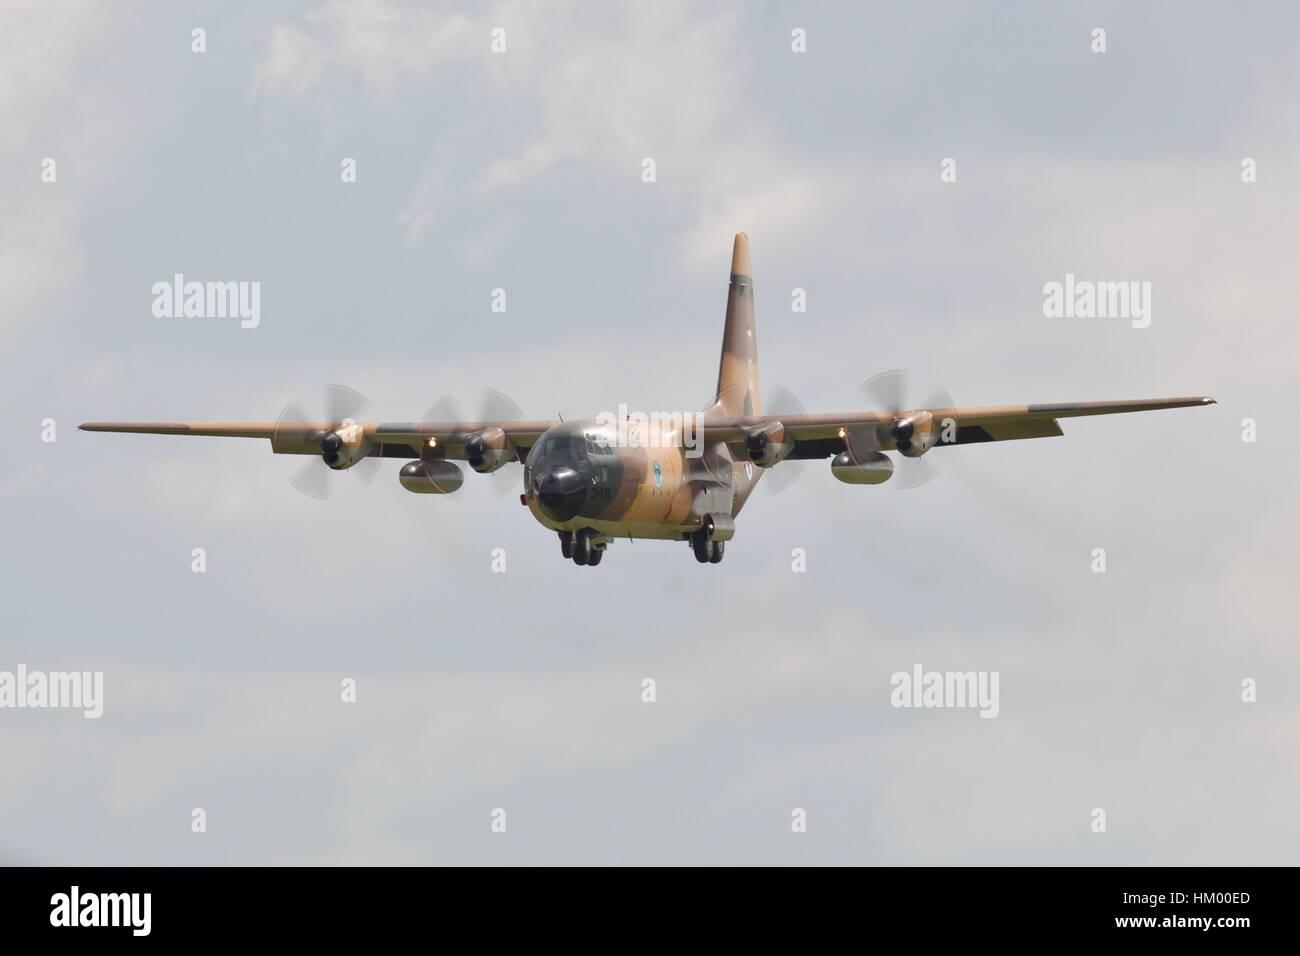 Algerian Air Force C-130H Hercules landing at RAF Fairford - Stock Image